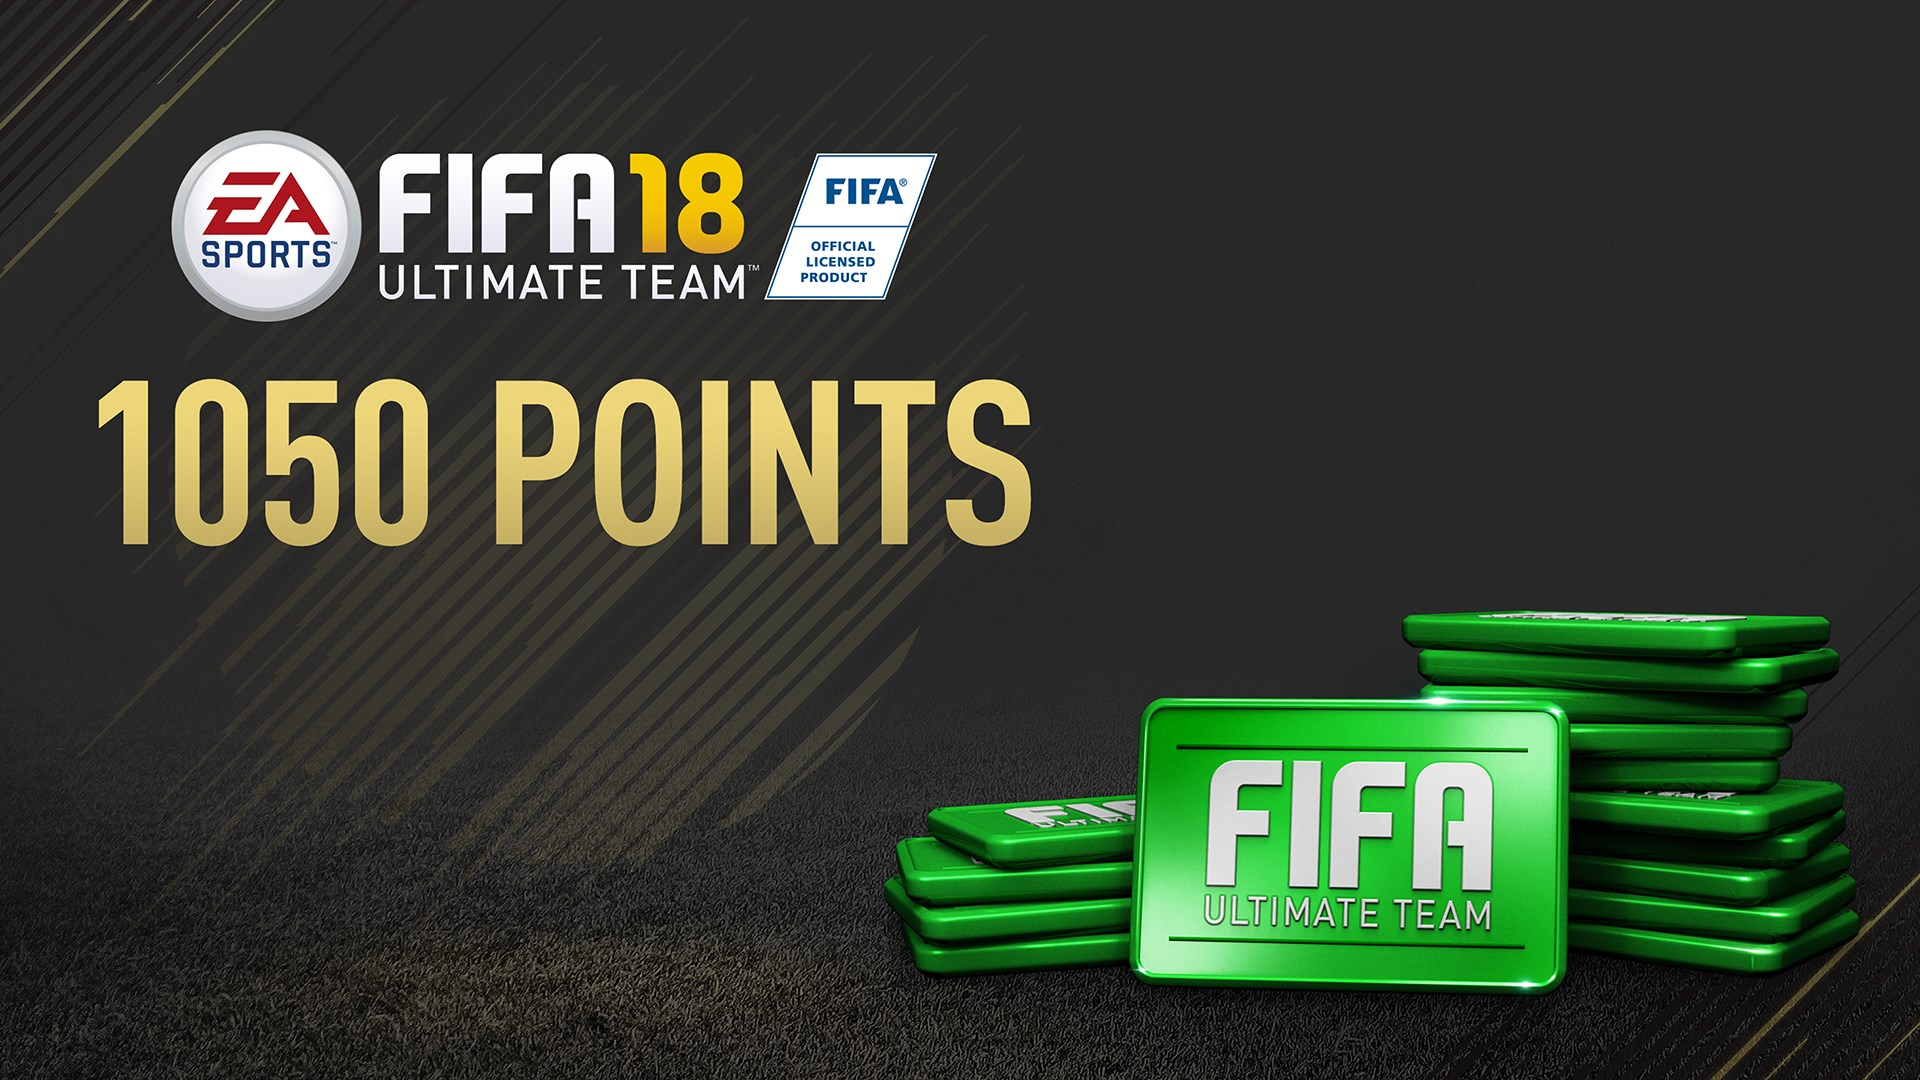 Pacchetto 1050 FIFA 18 Points